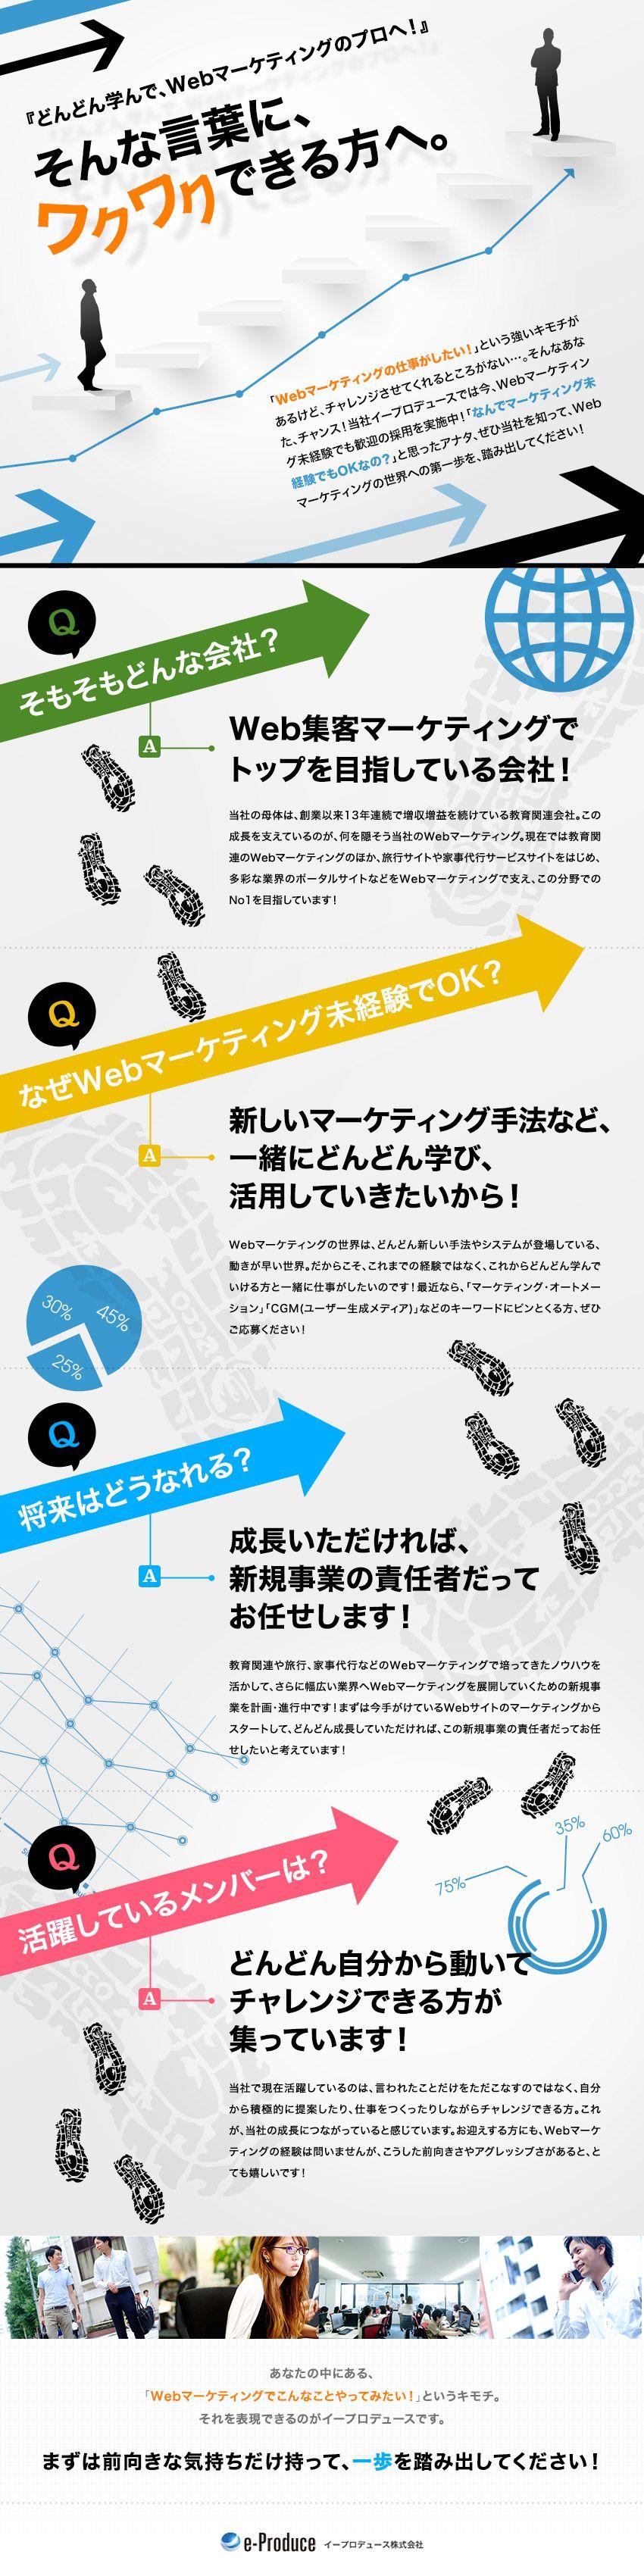 Nimura Daisuke Web Artworks On Tumblr ブックデザイン